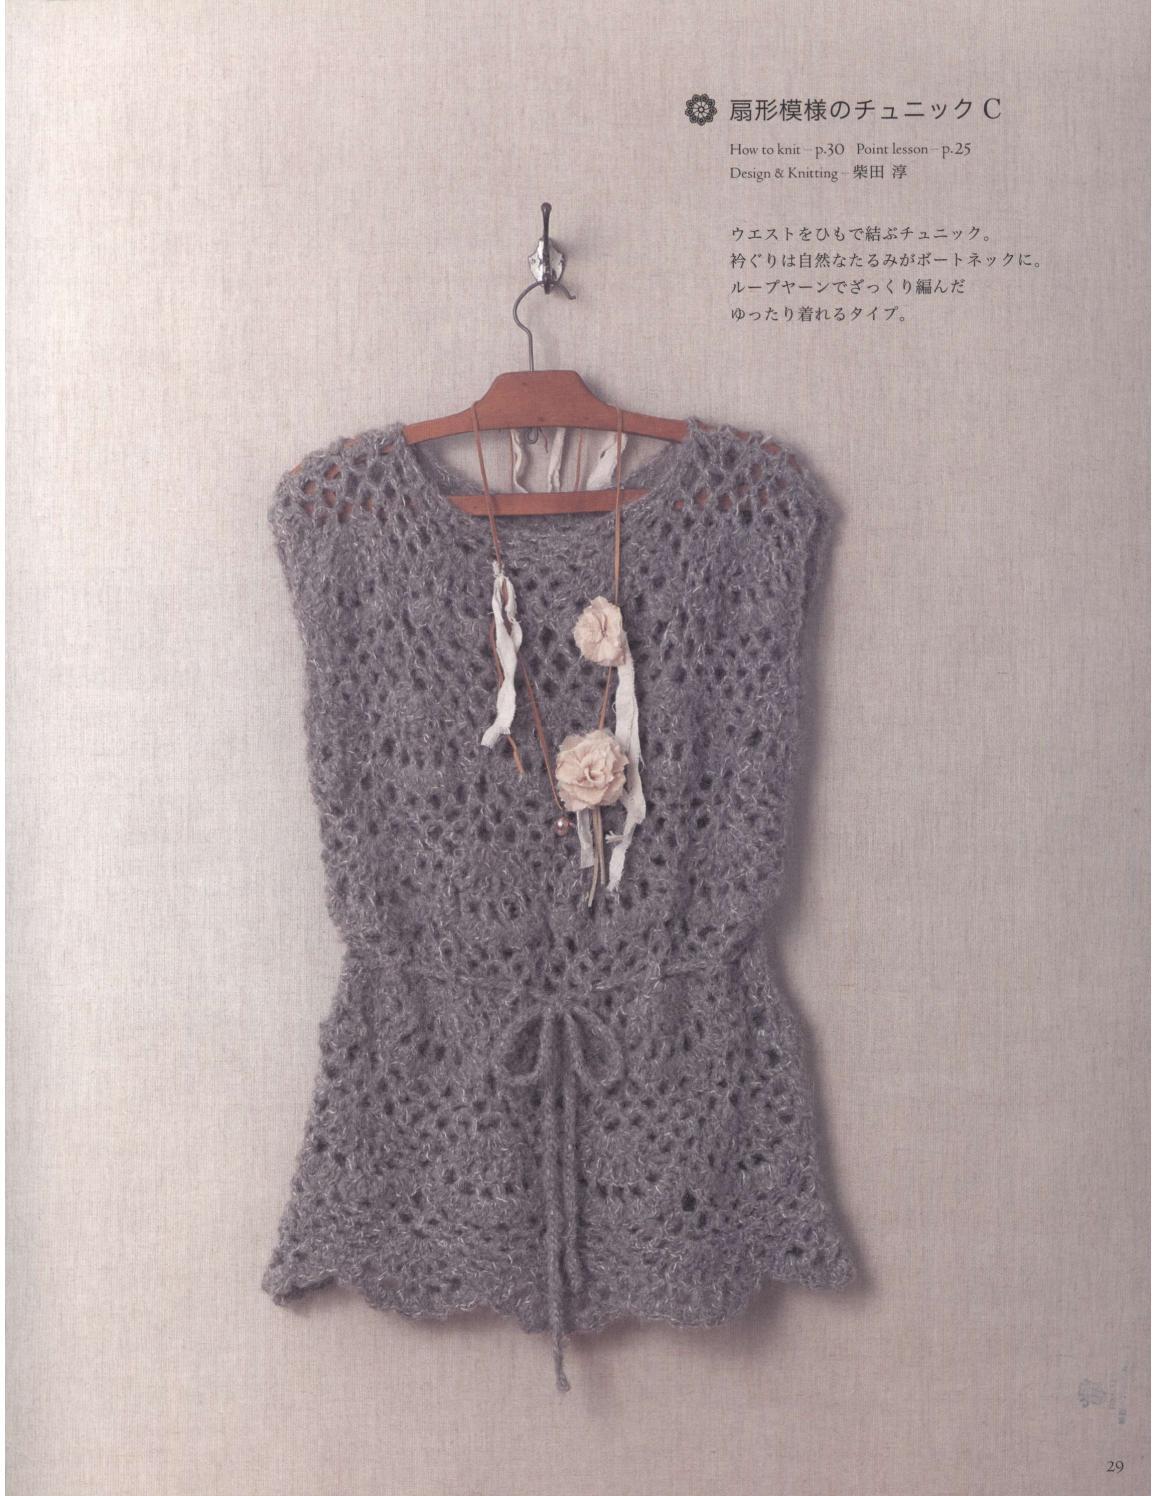 Asahi original crochet best selection 2012 page 29